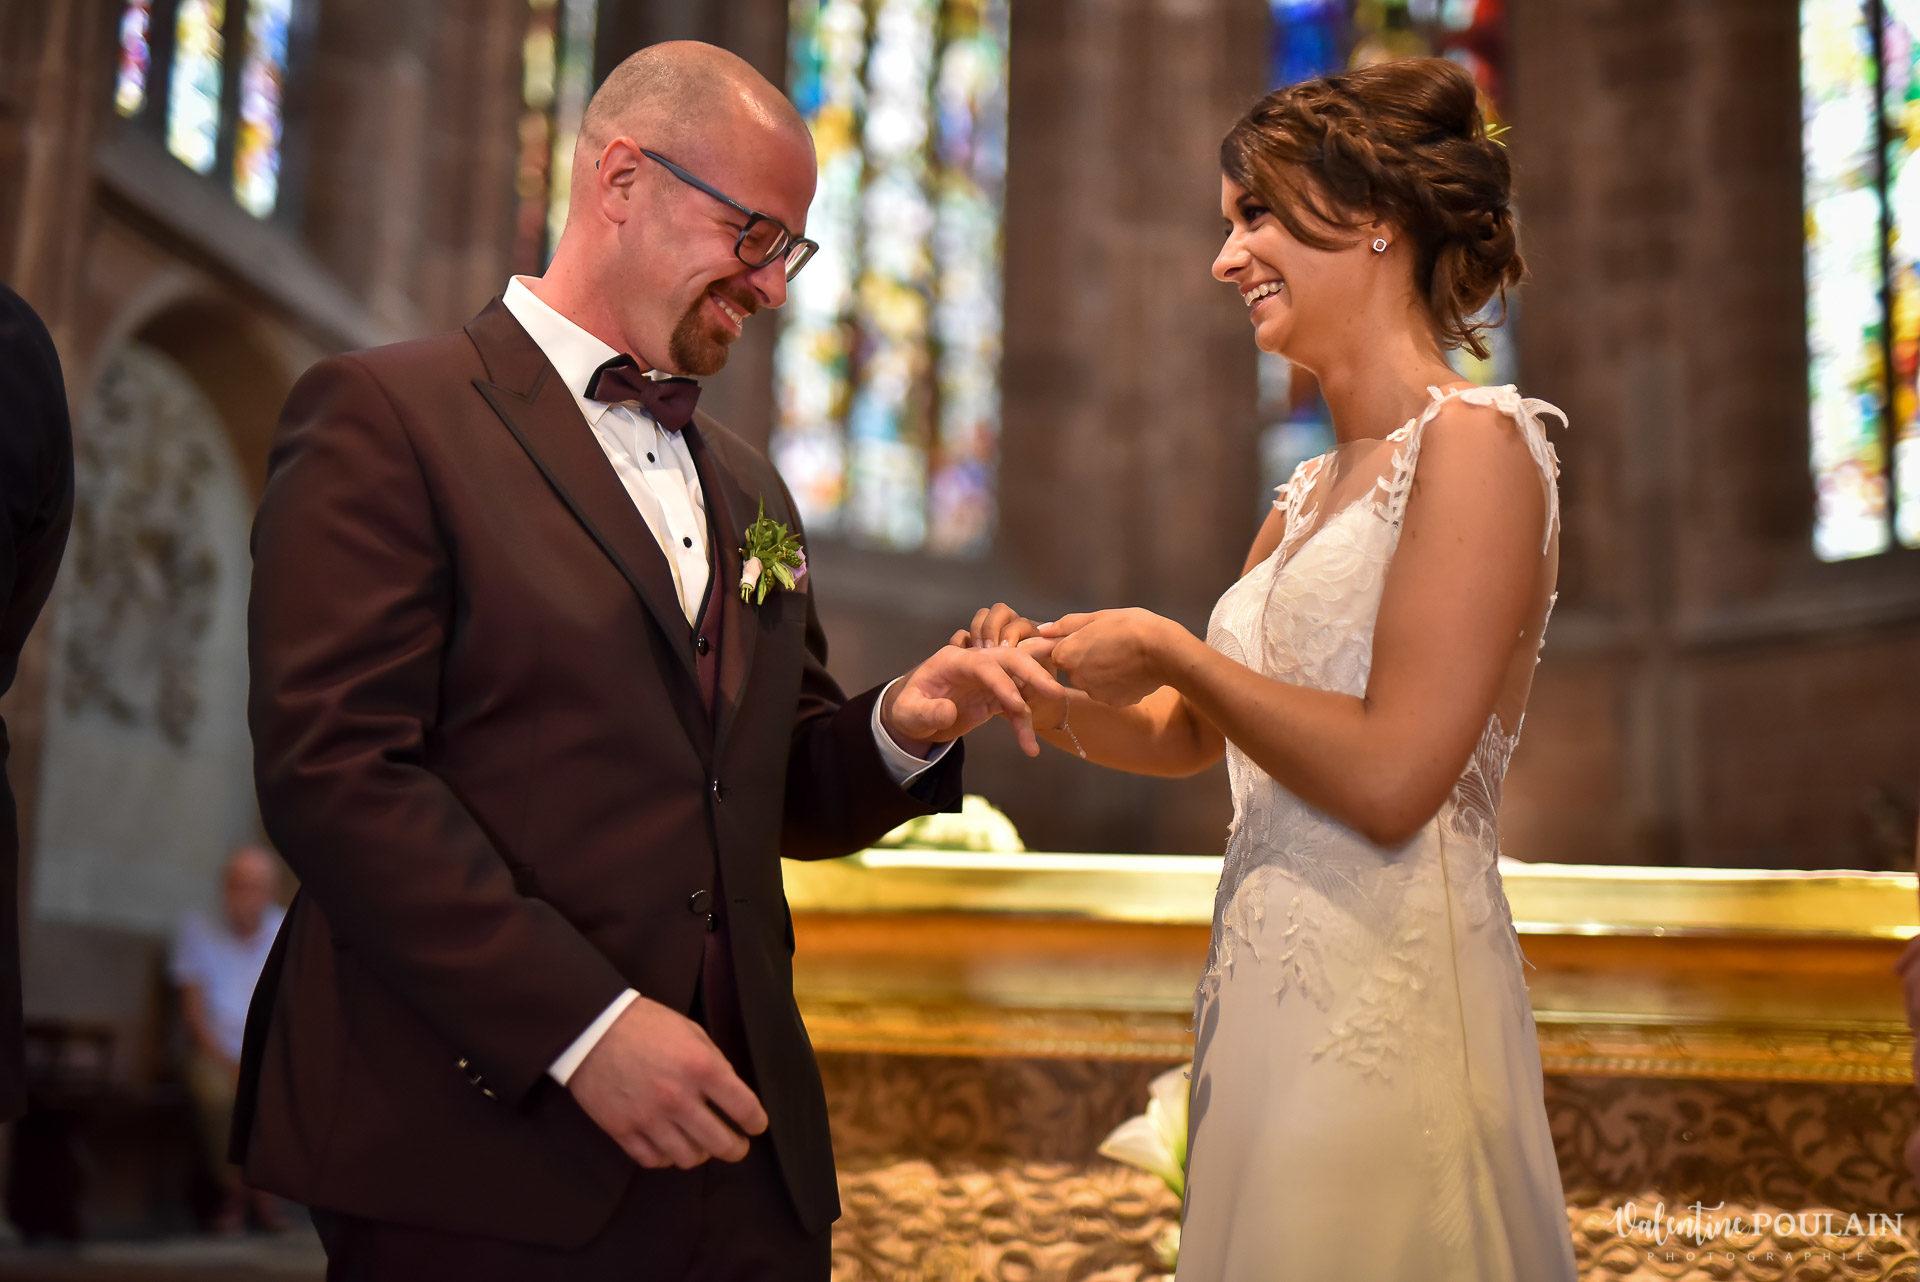 Mariage convivial Saverne - Valentine Poulain oui